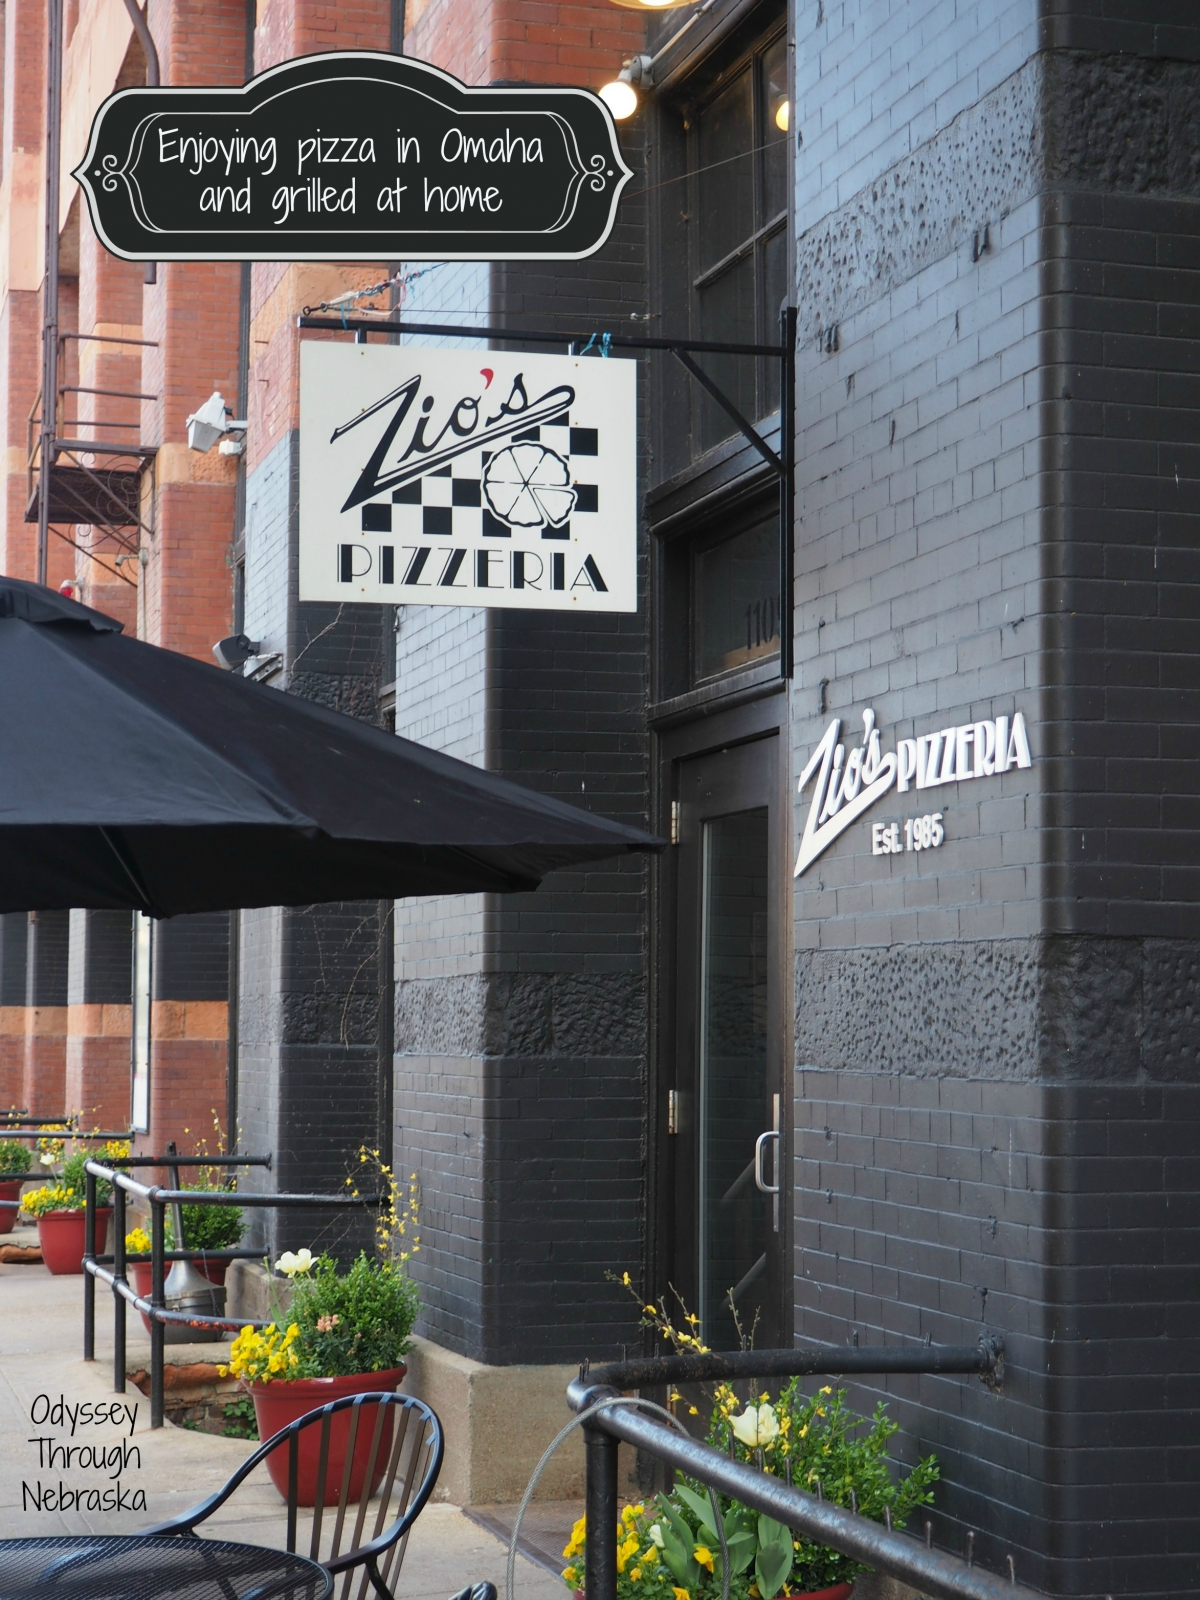 Zio's Pizzeria serves New York style pizza